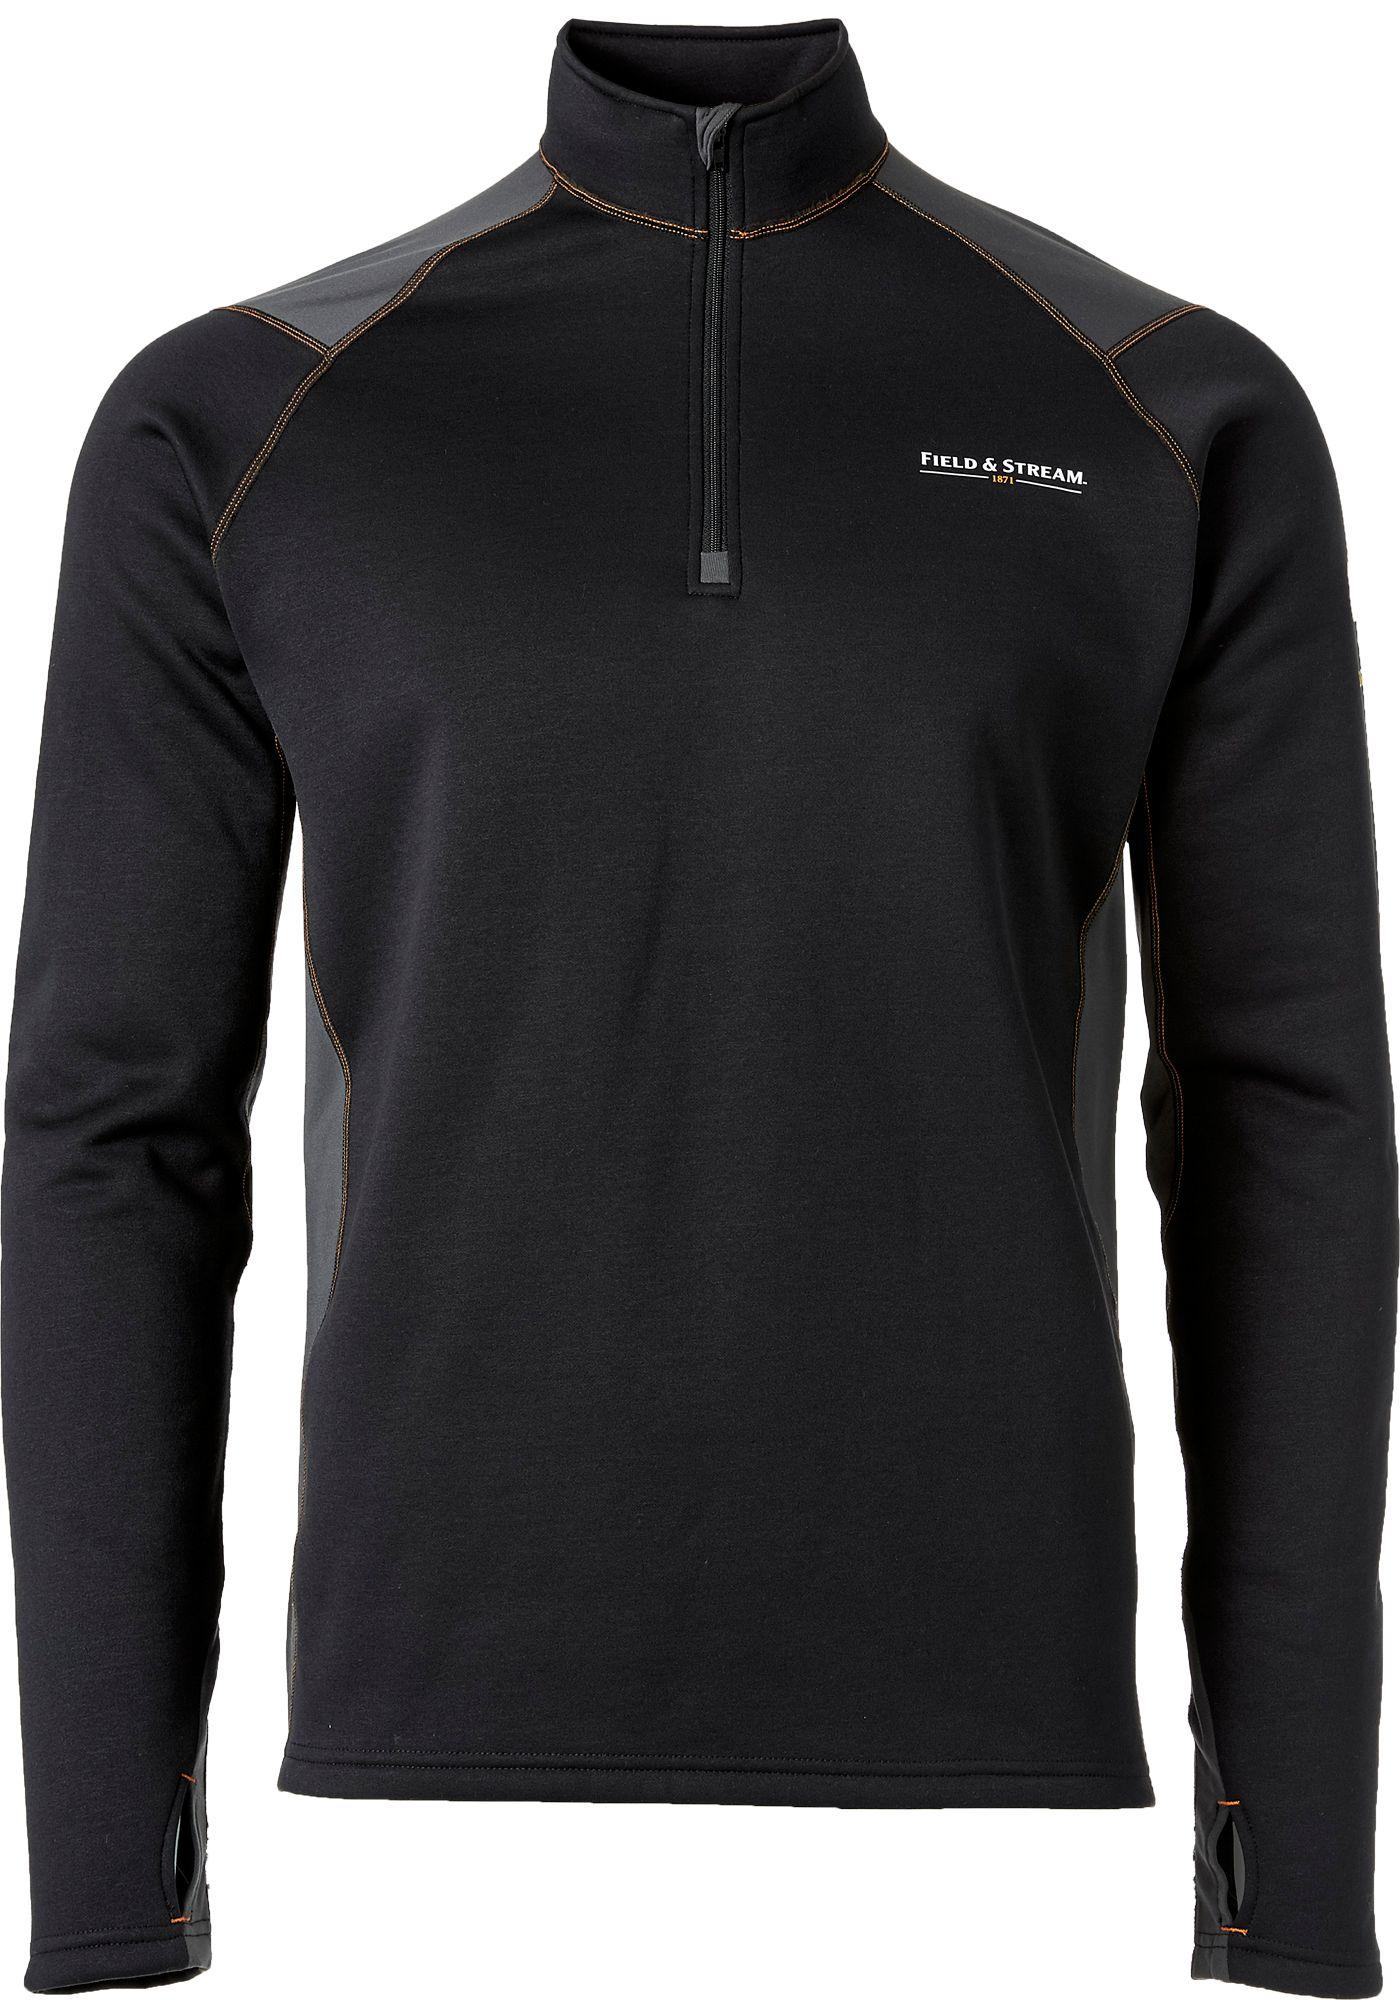 Field & Stream Men's Base Defense Arctic Chill Half Zip Base Layer Shirt, Size: Medium, Black thumbnail